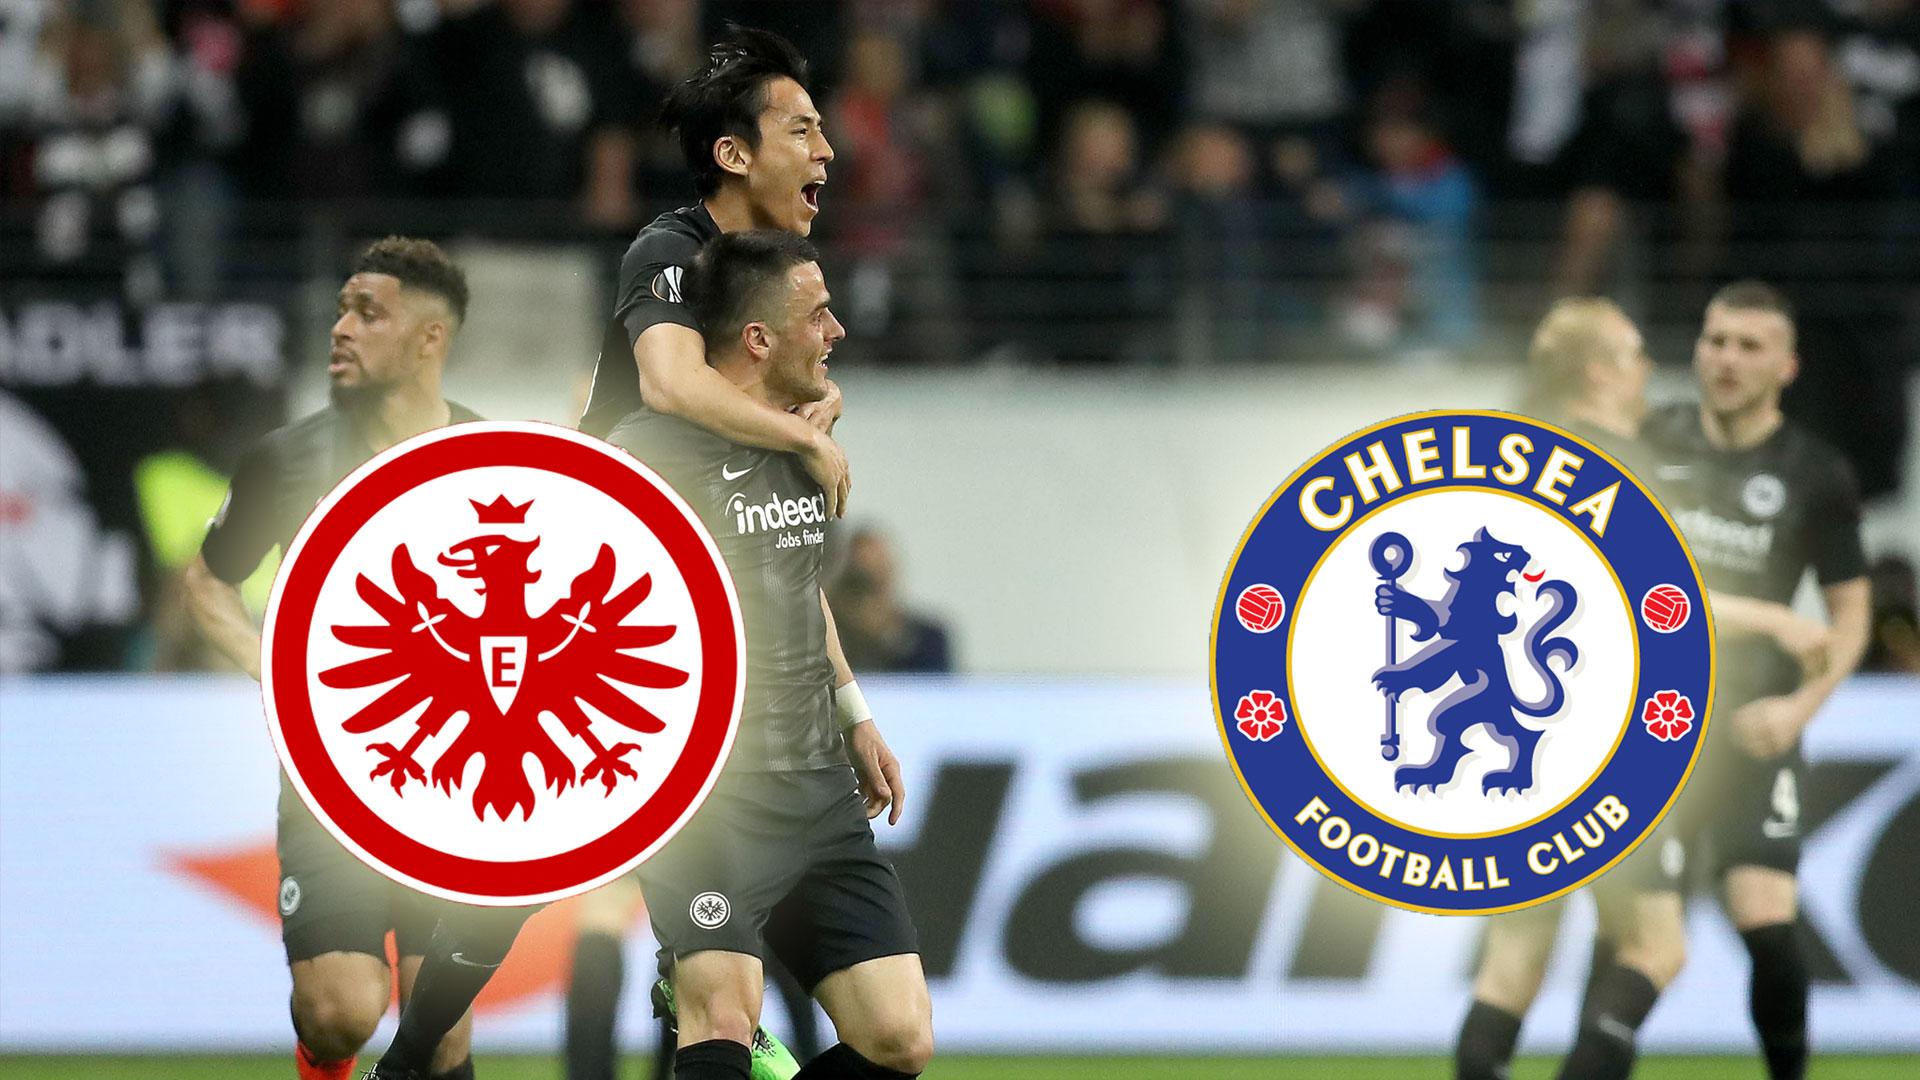 Frankfurt Chelsea Live Ticker